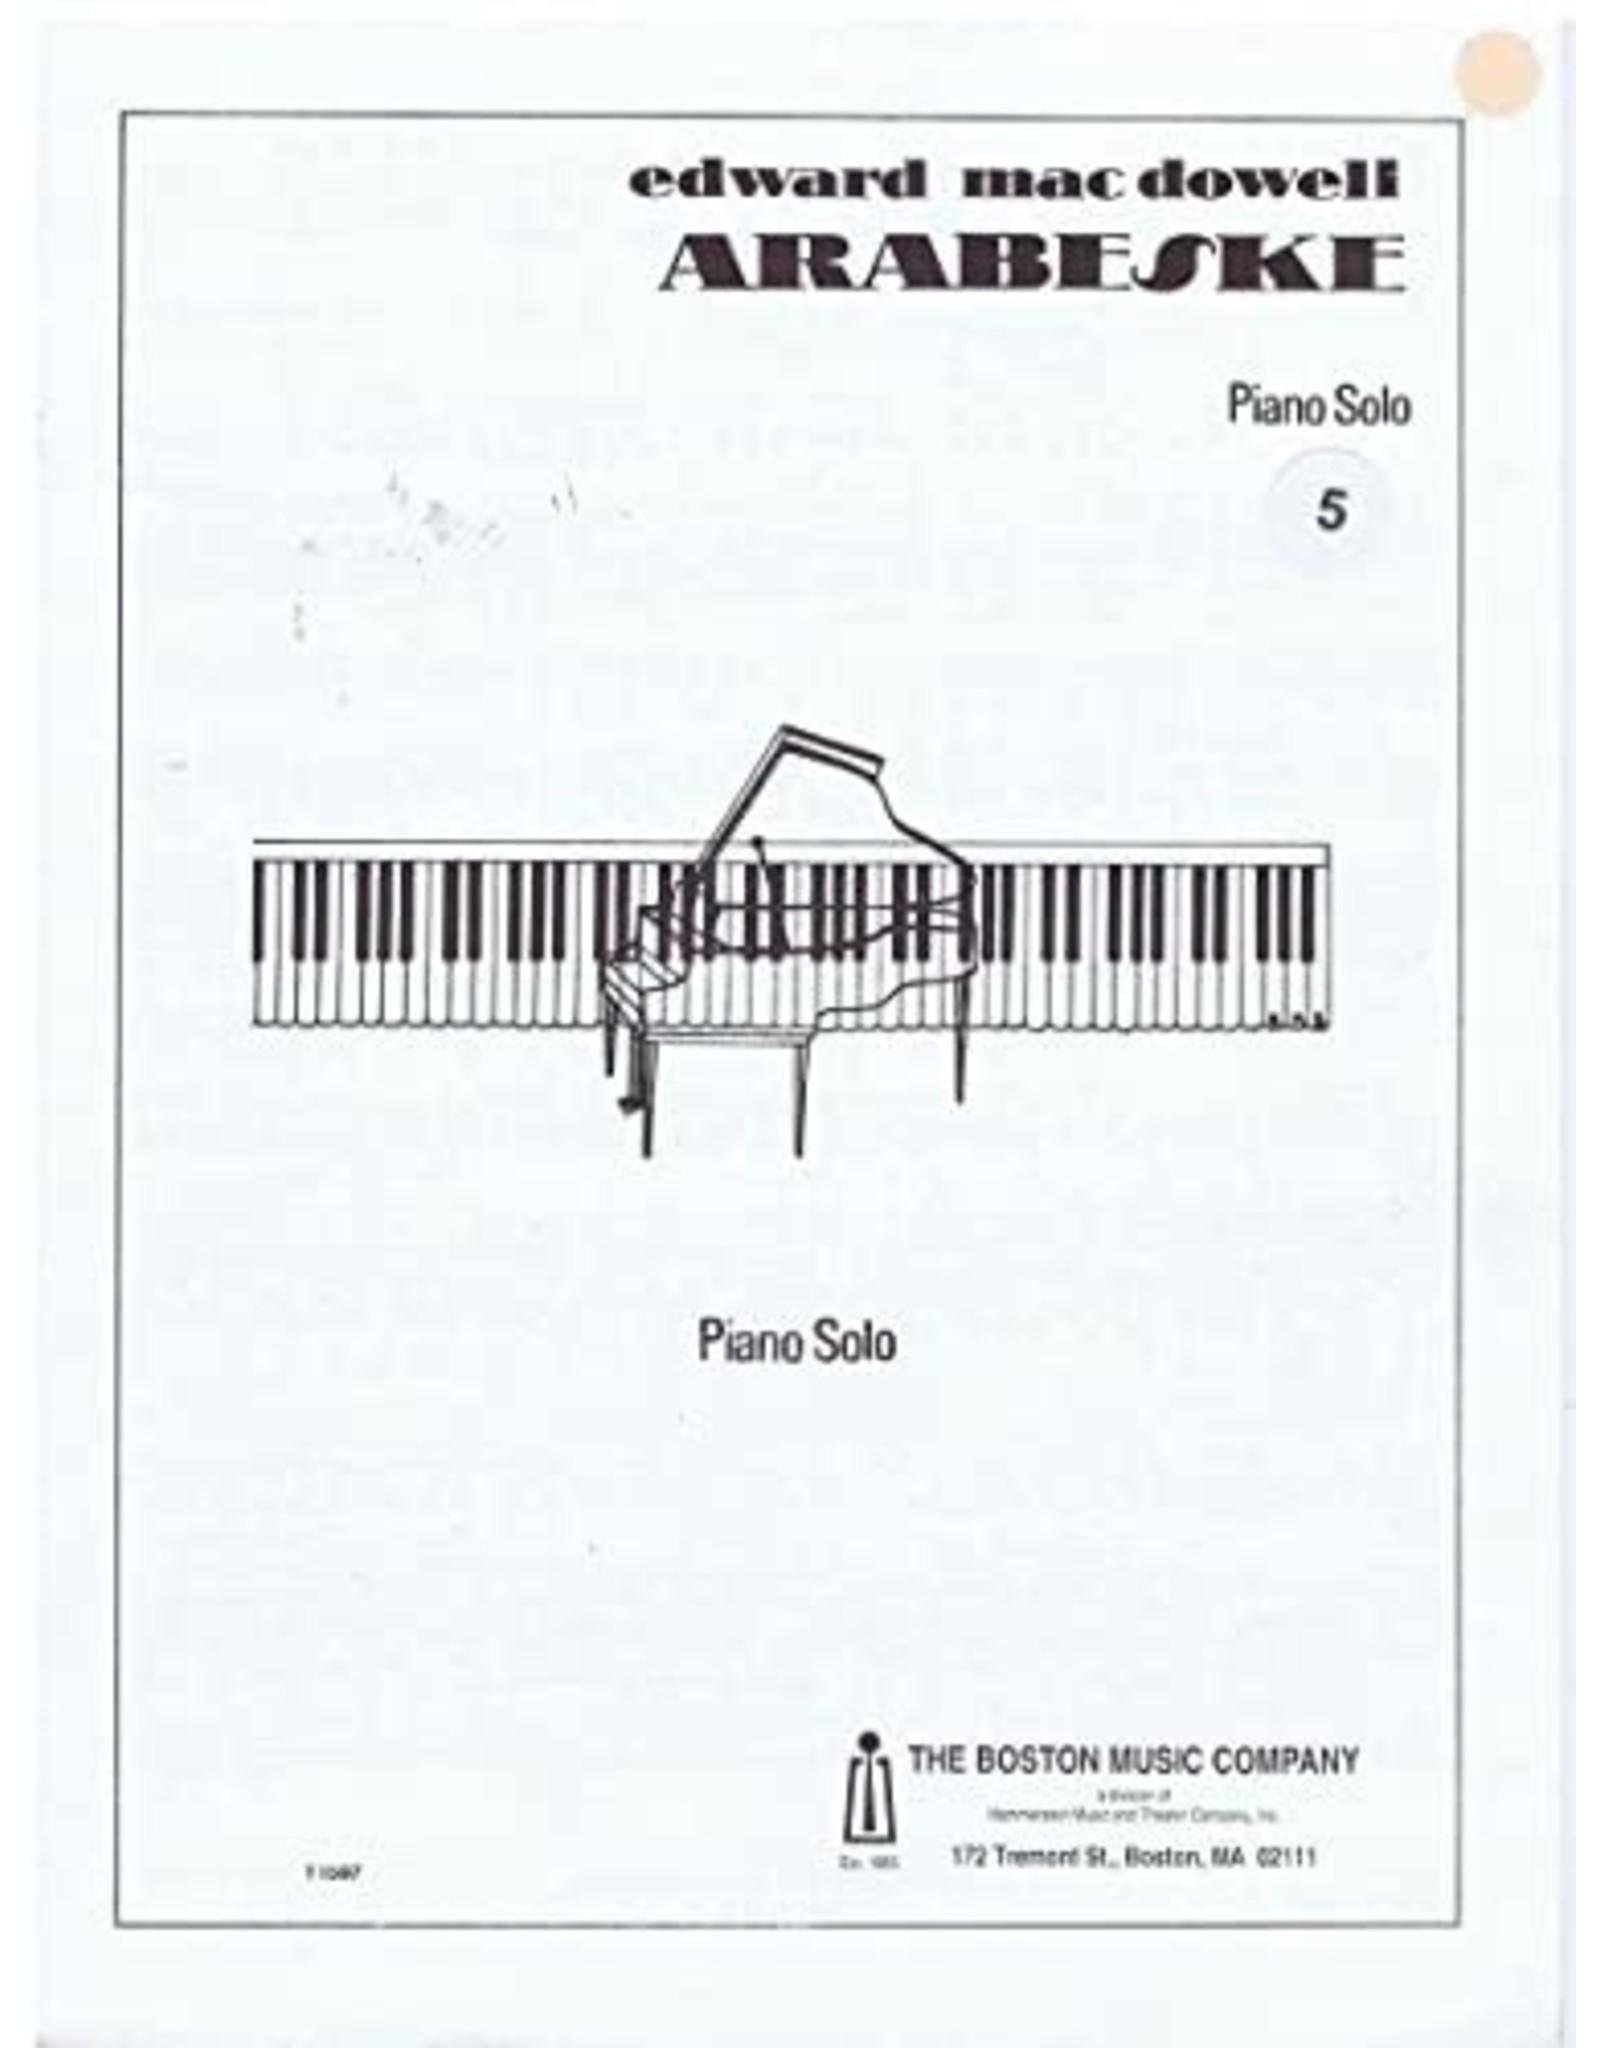 Hal Leonard Macdowell - Arabeske